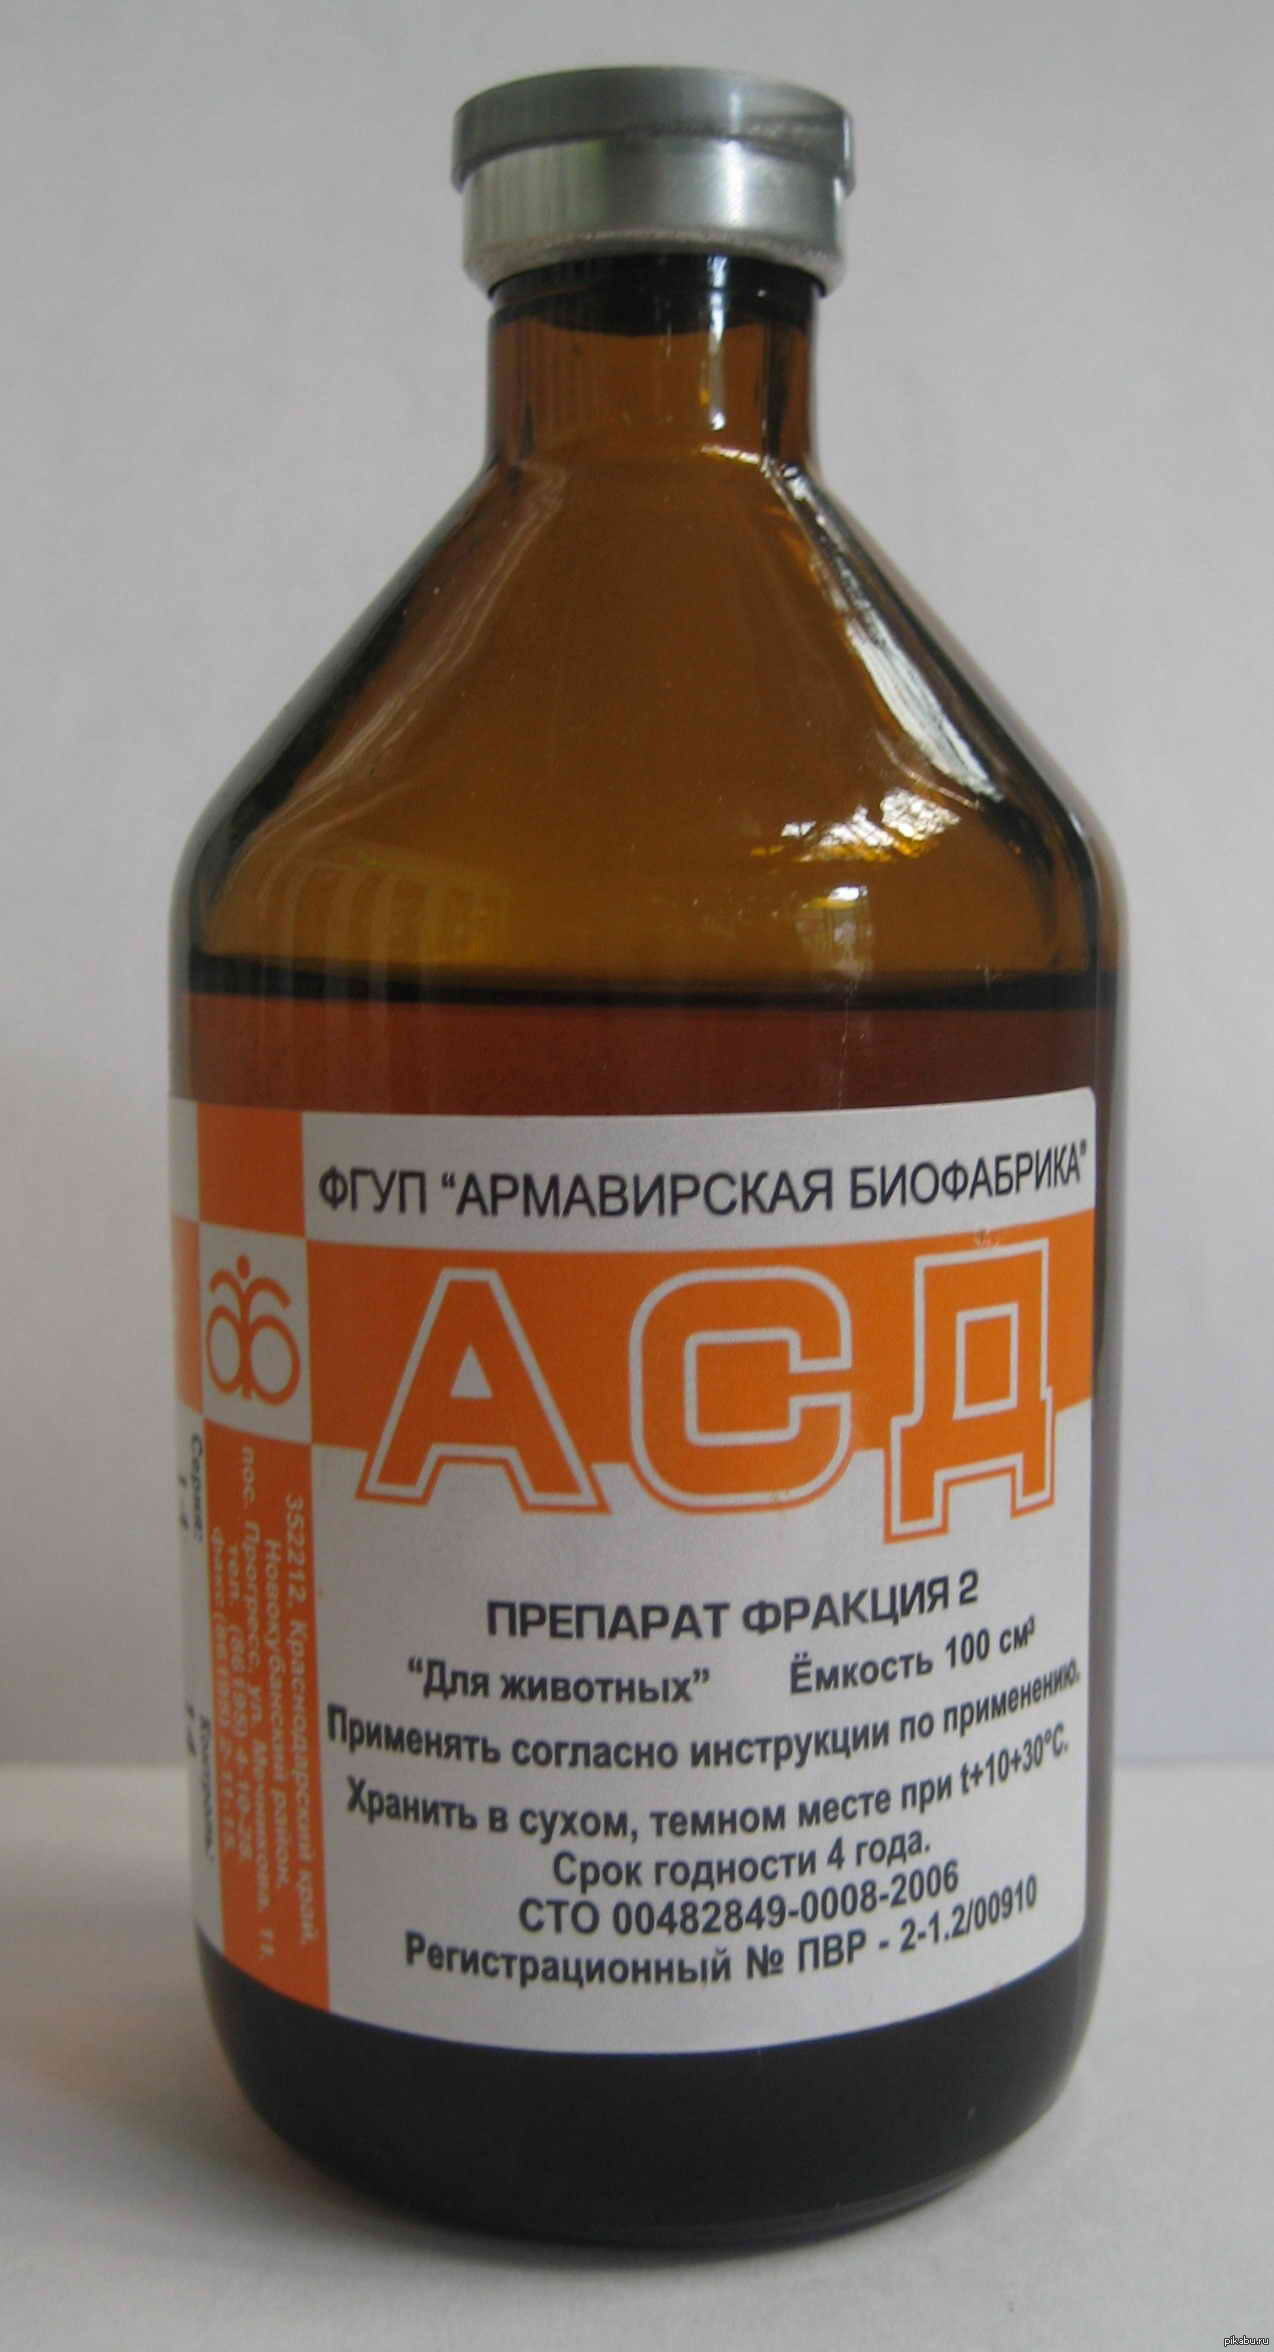 Антисептик-стимулятор дорогова: фракция асд-2 для лечения людей